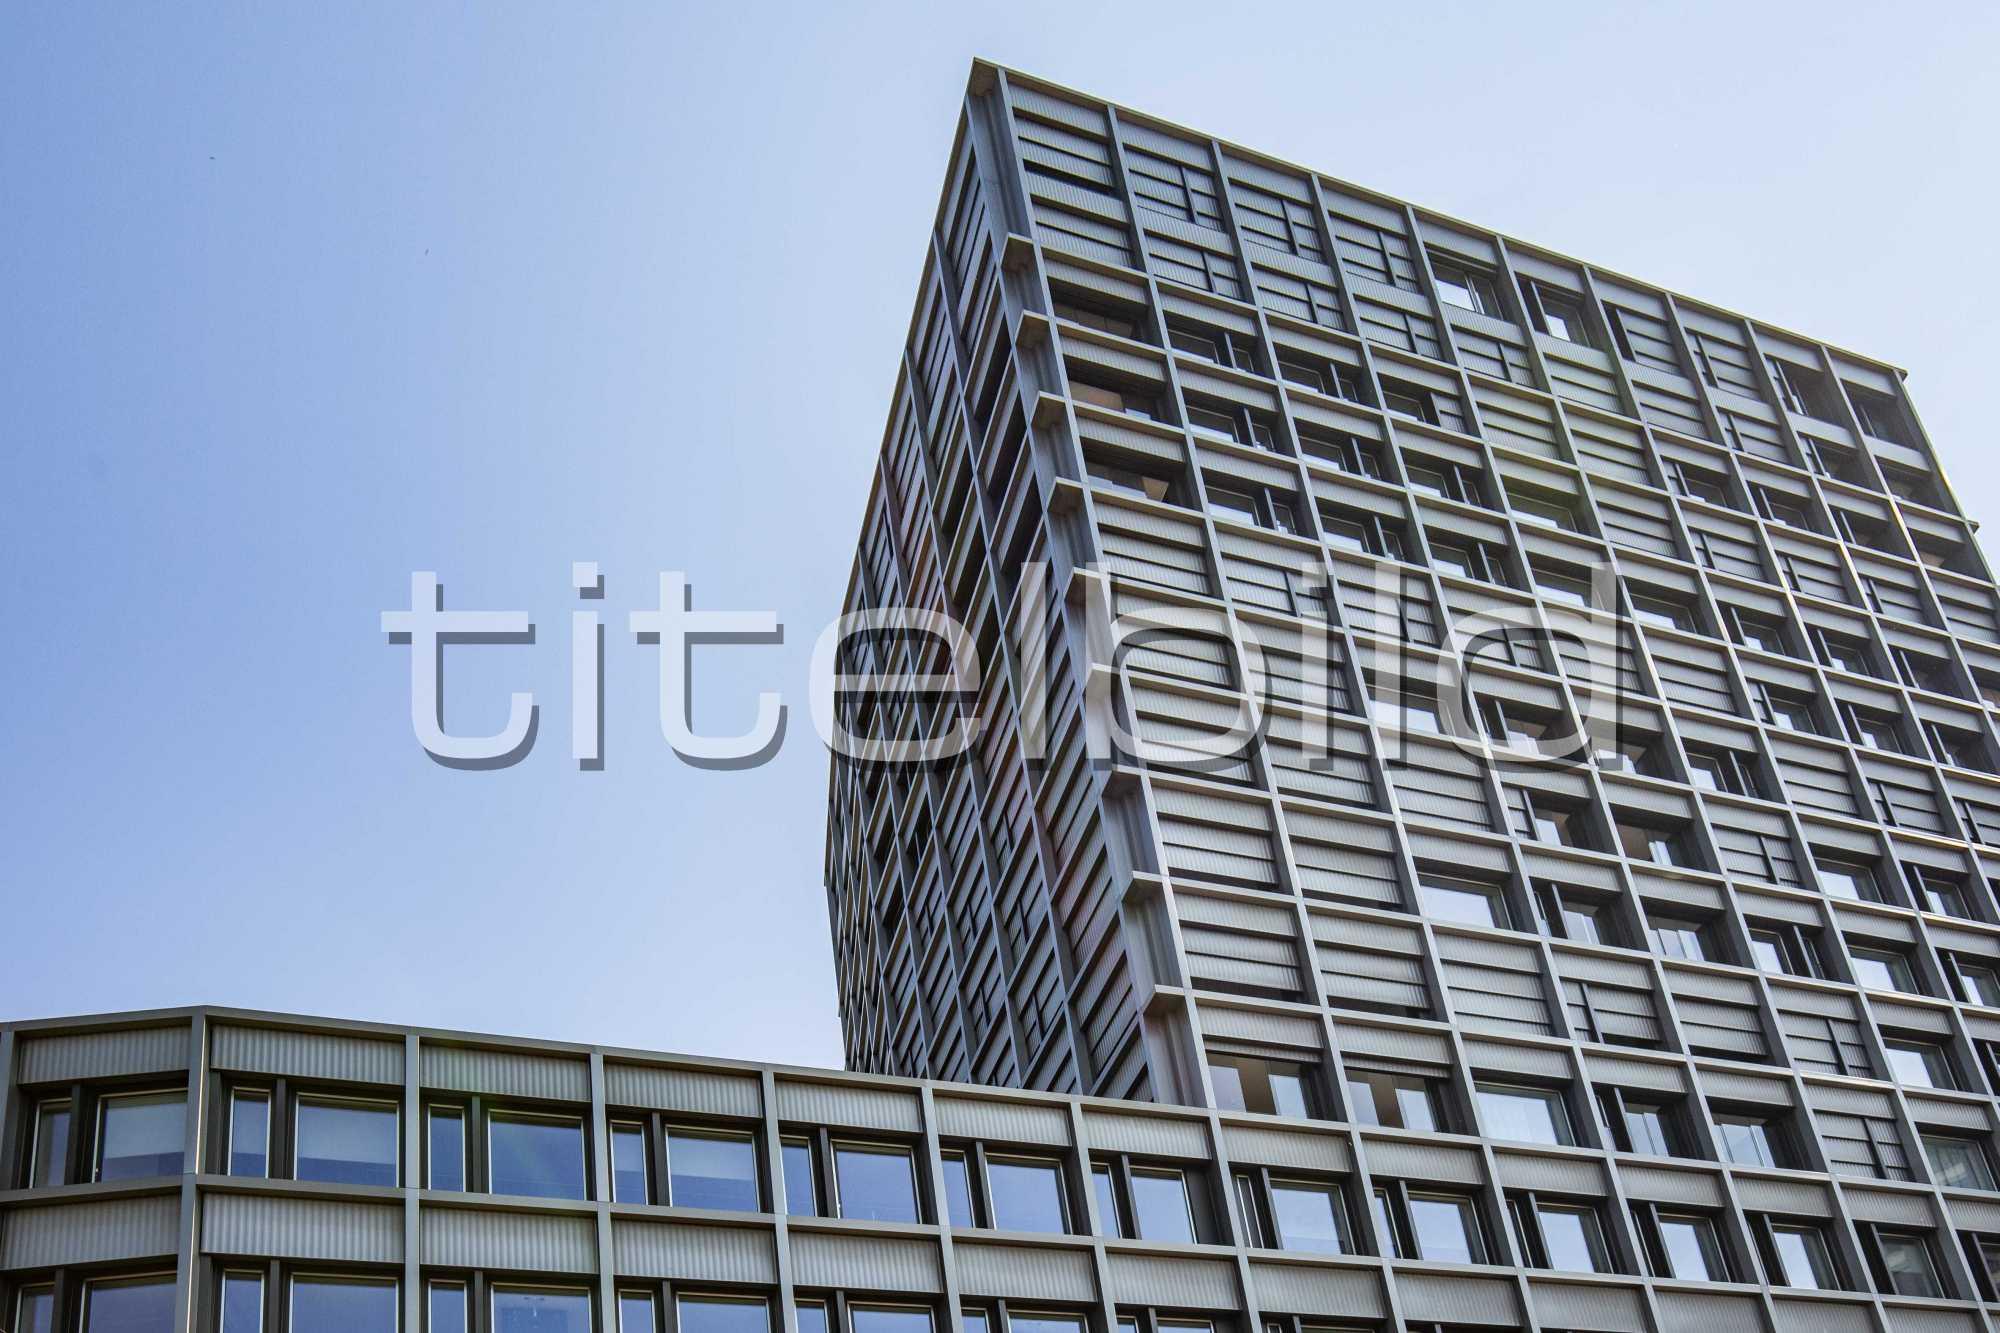 Projektbild-Nr. 3: Europaallee Baufeld G